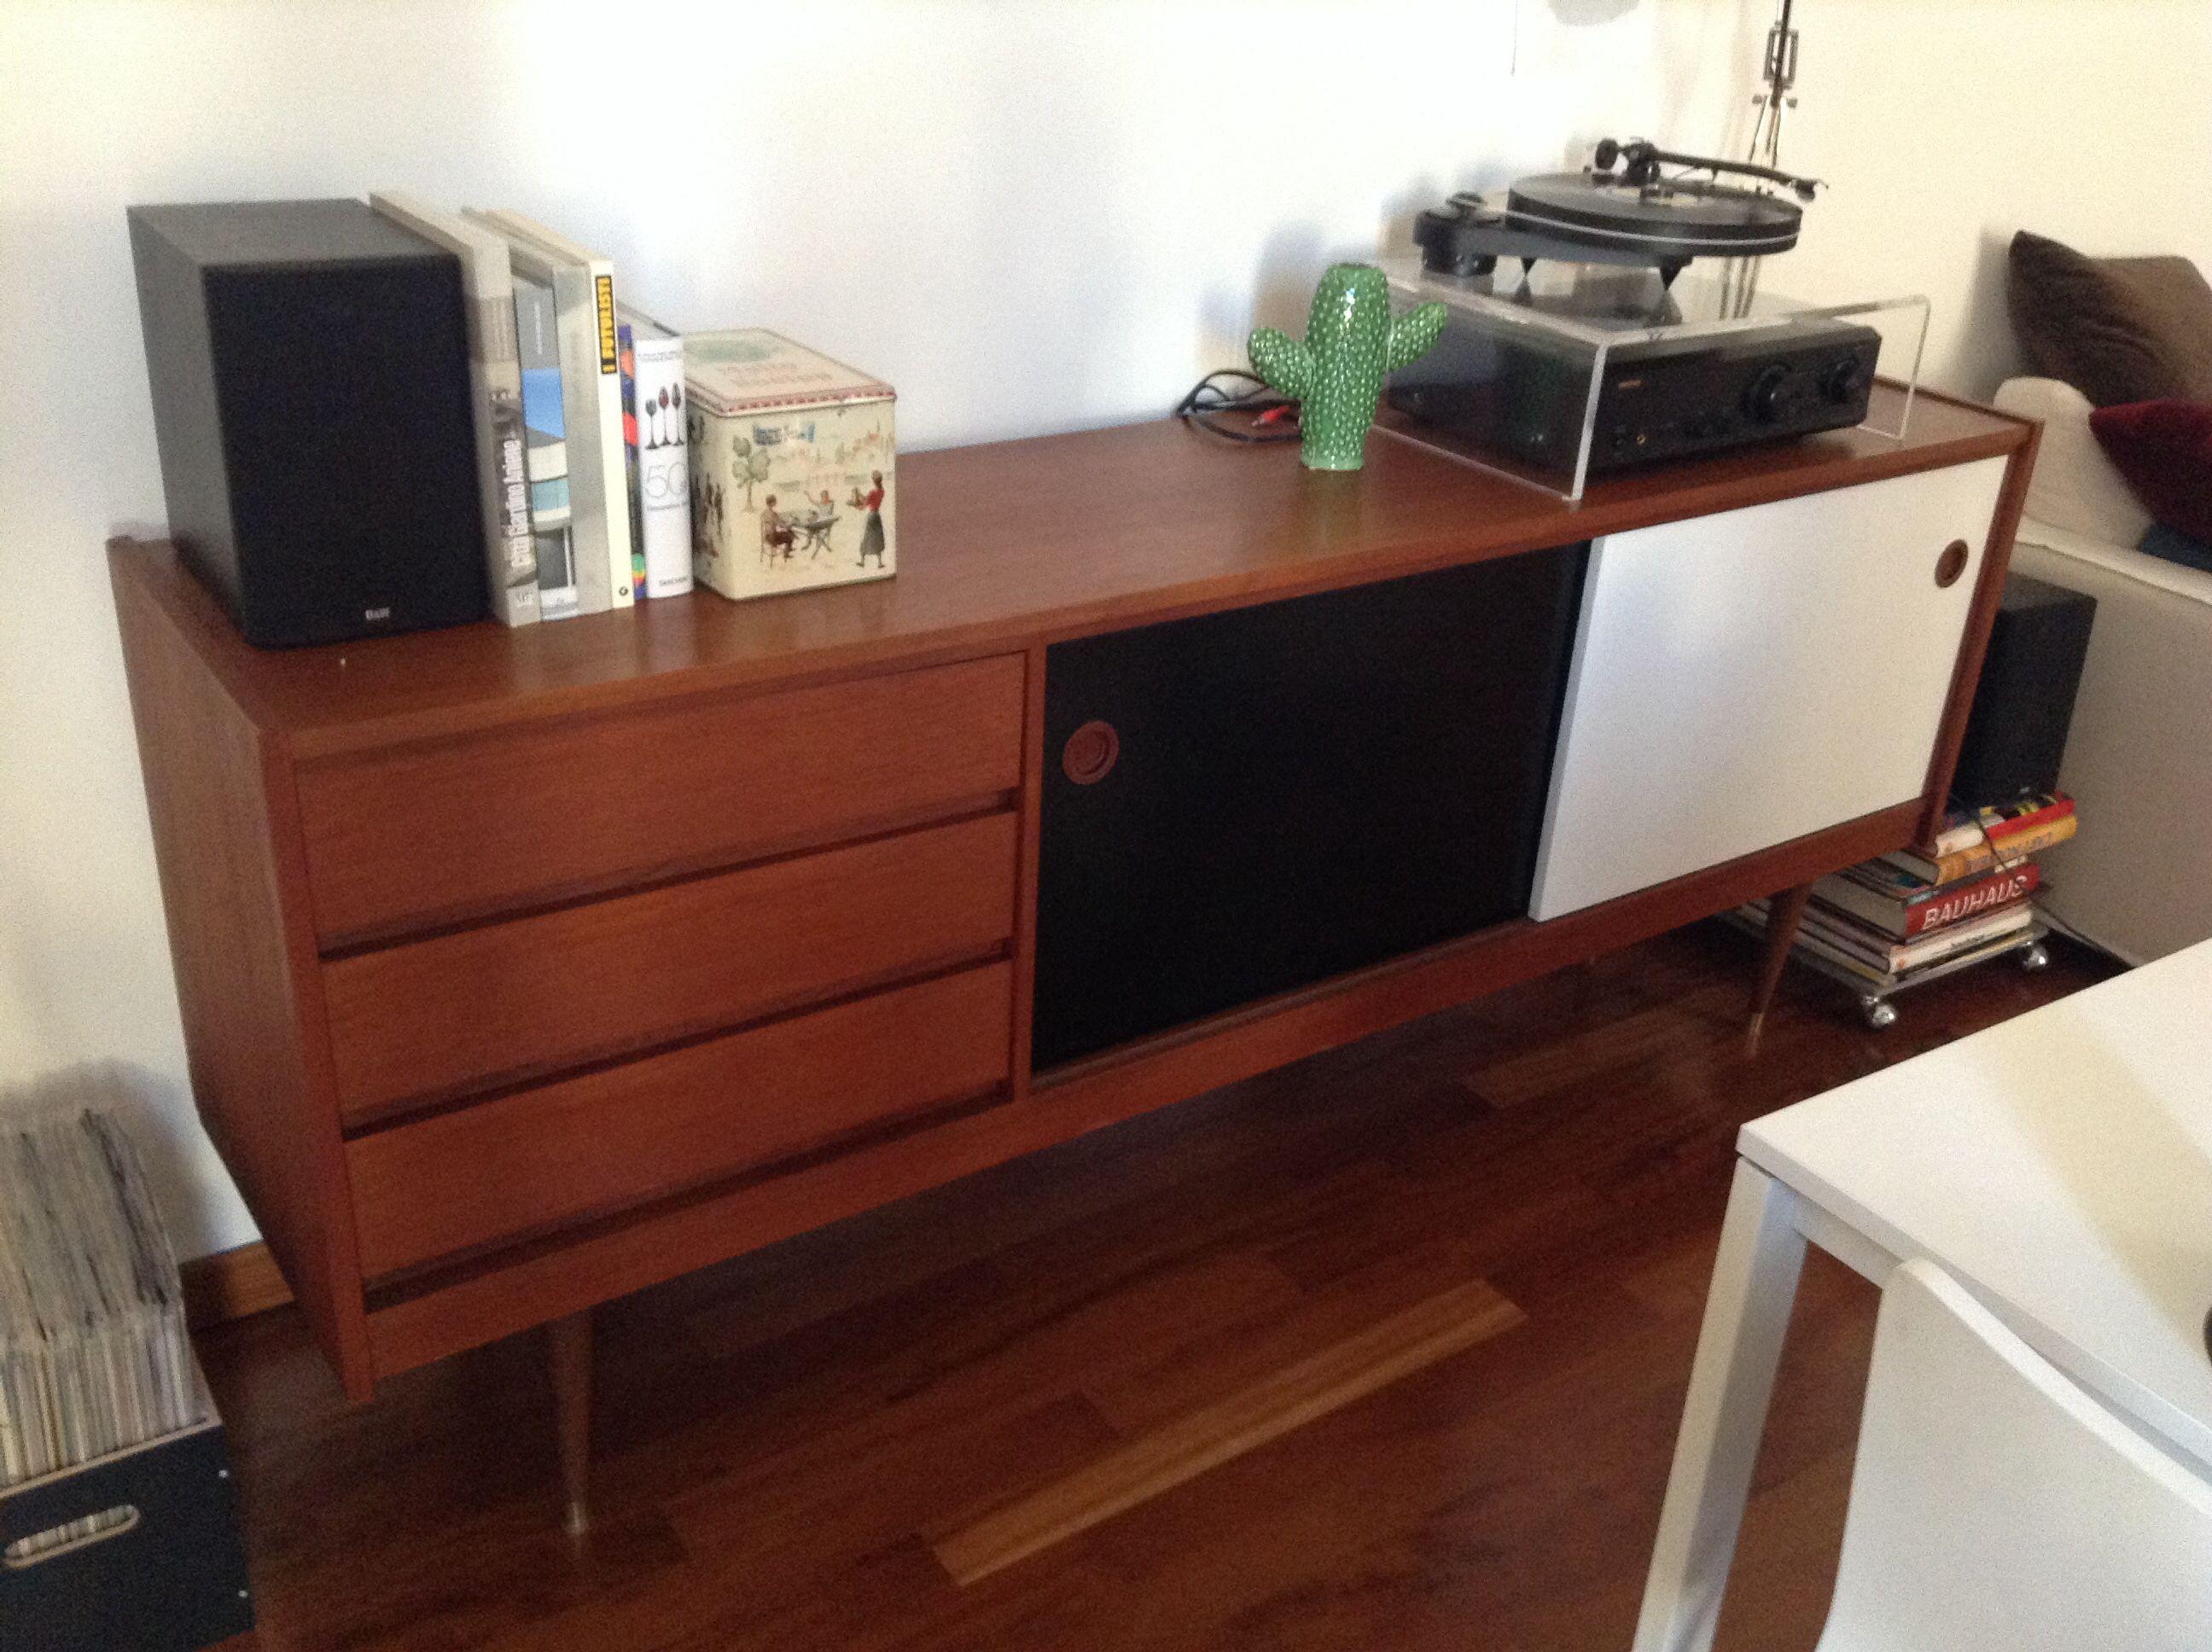 Danish vintage sideboard and music corner.. In progress!